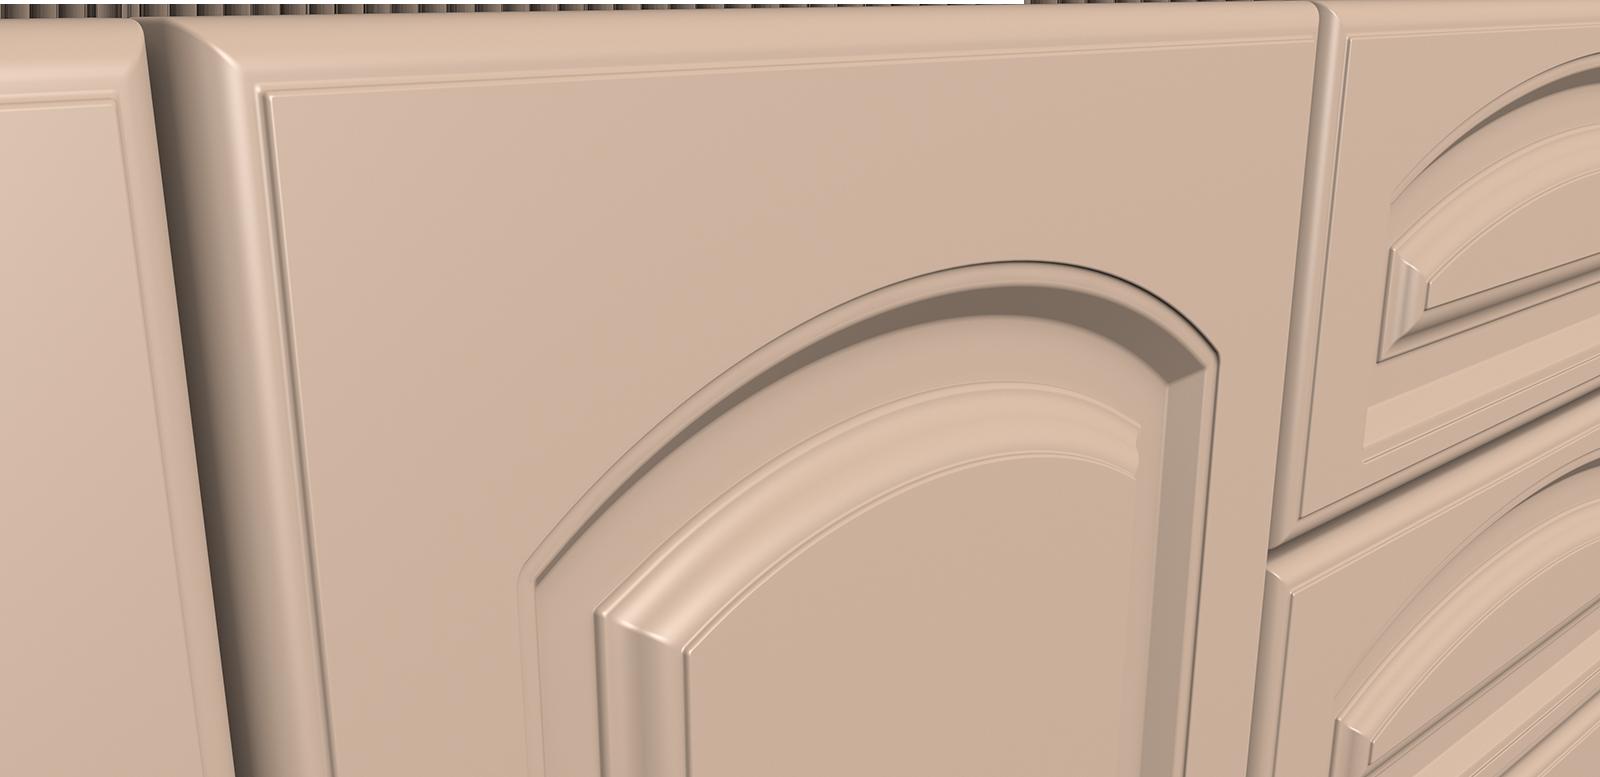 Fronturi MDF frezate - Colectia Clasic - M10A